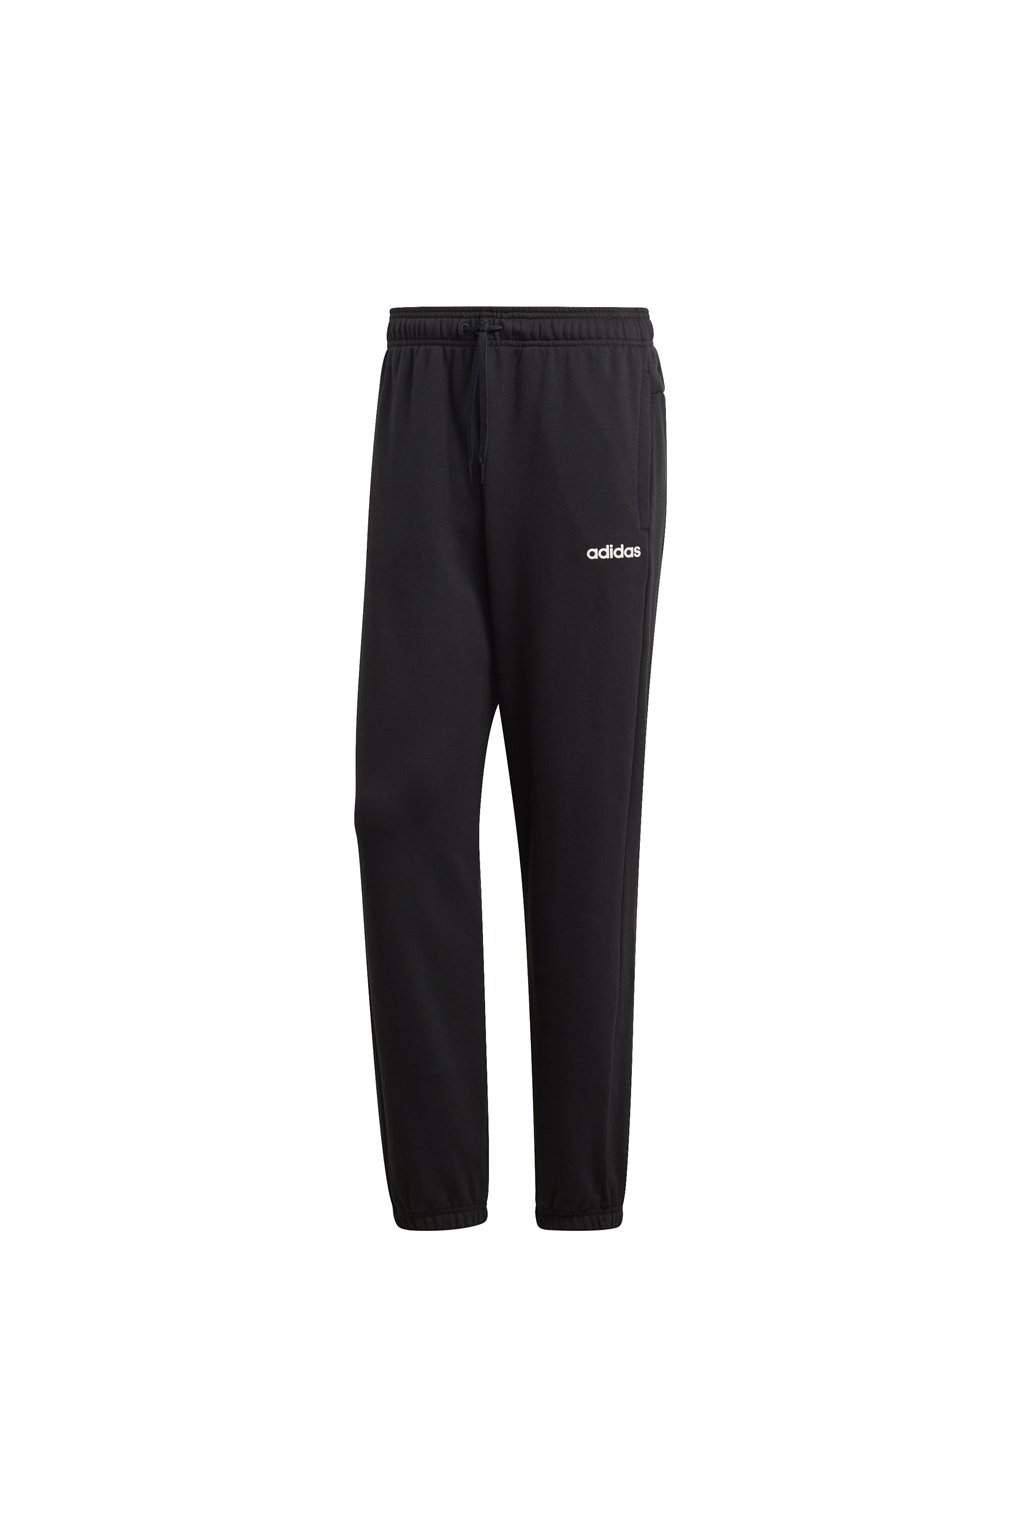 Pánske tepláky adidas Essentials Plain Slim Pant FT čierne DU0371